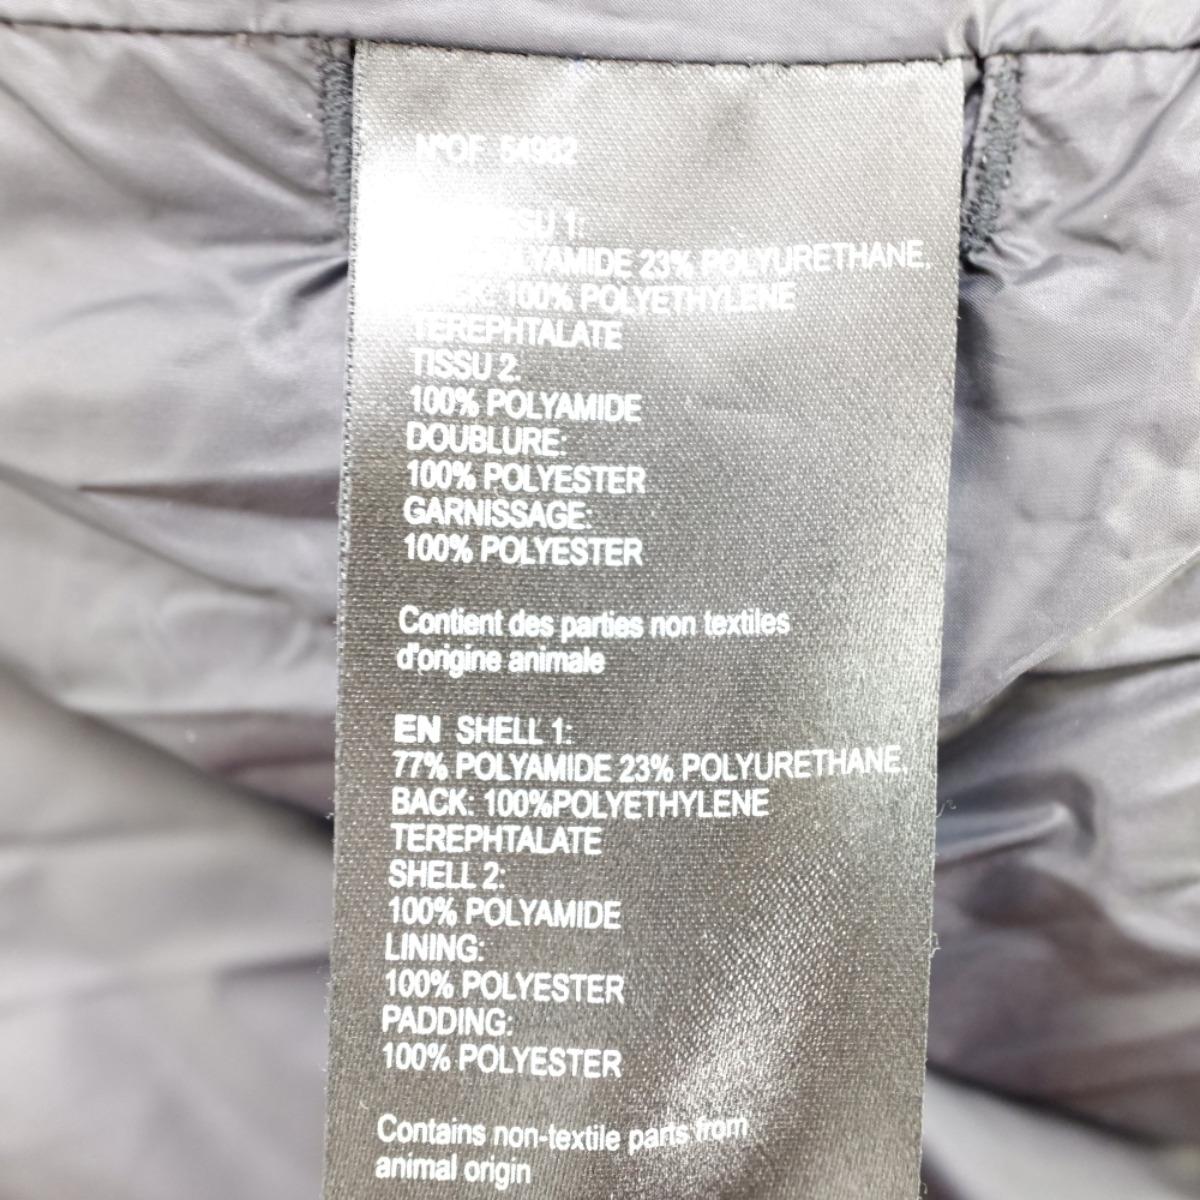 FUSALPフザルプ 19年製 LUCHO IIアームロゴワッペン付 ダウンジャケット50 ブラック メンズxshrCtQdB